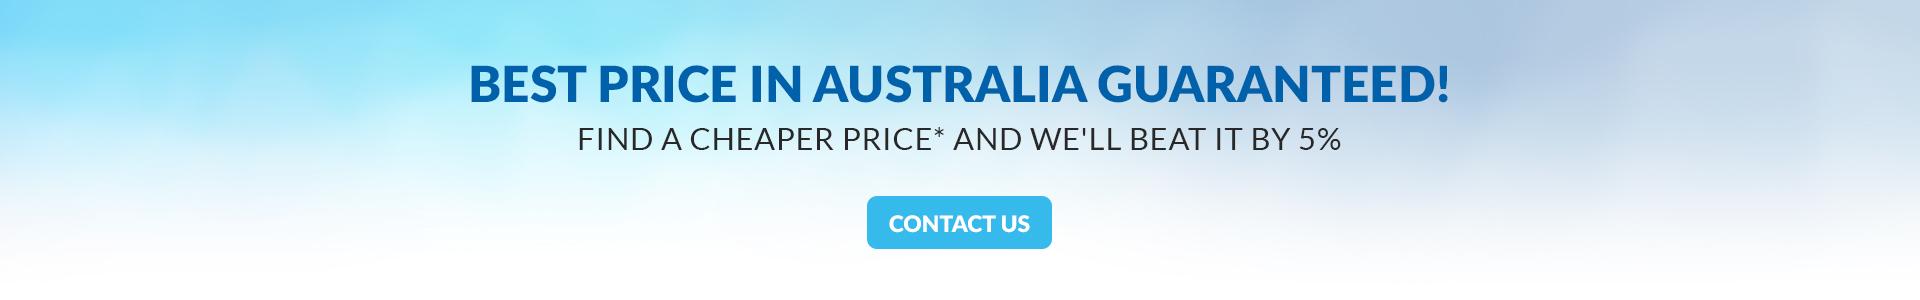 price-match-banner.jpg